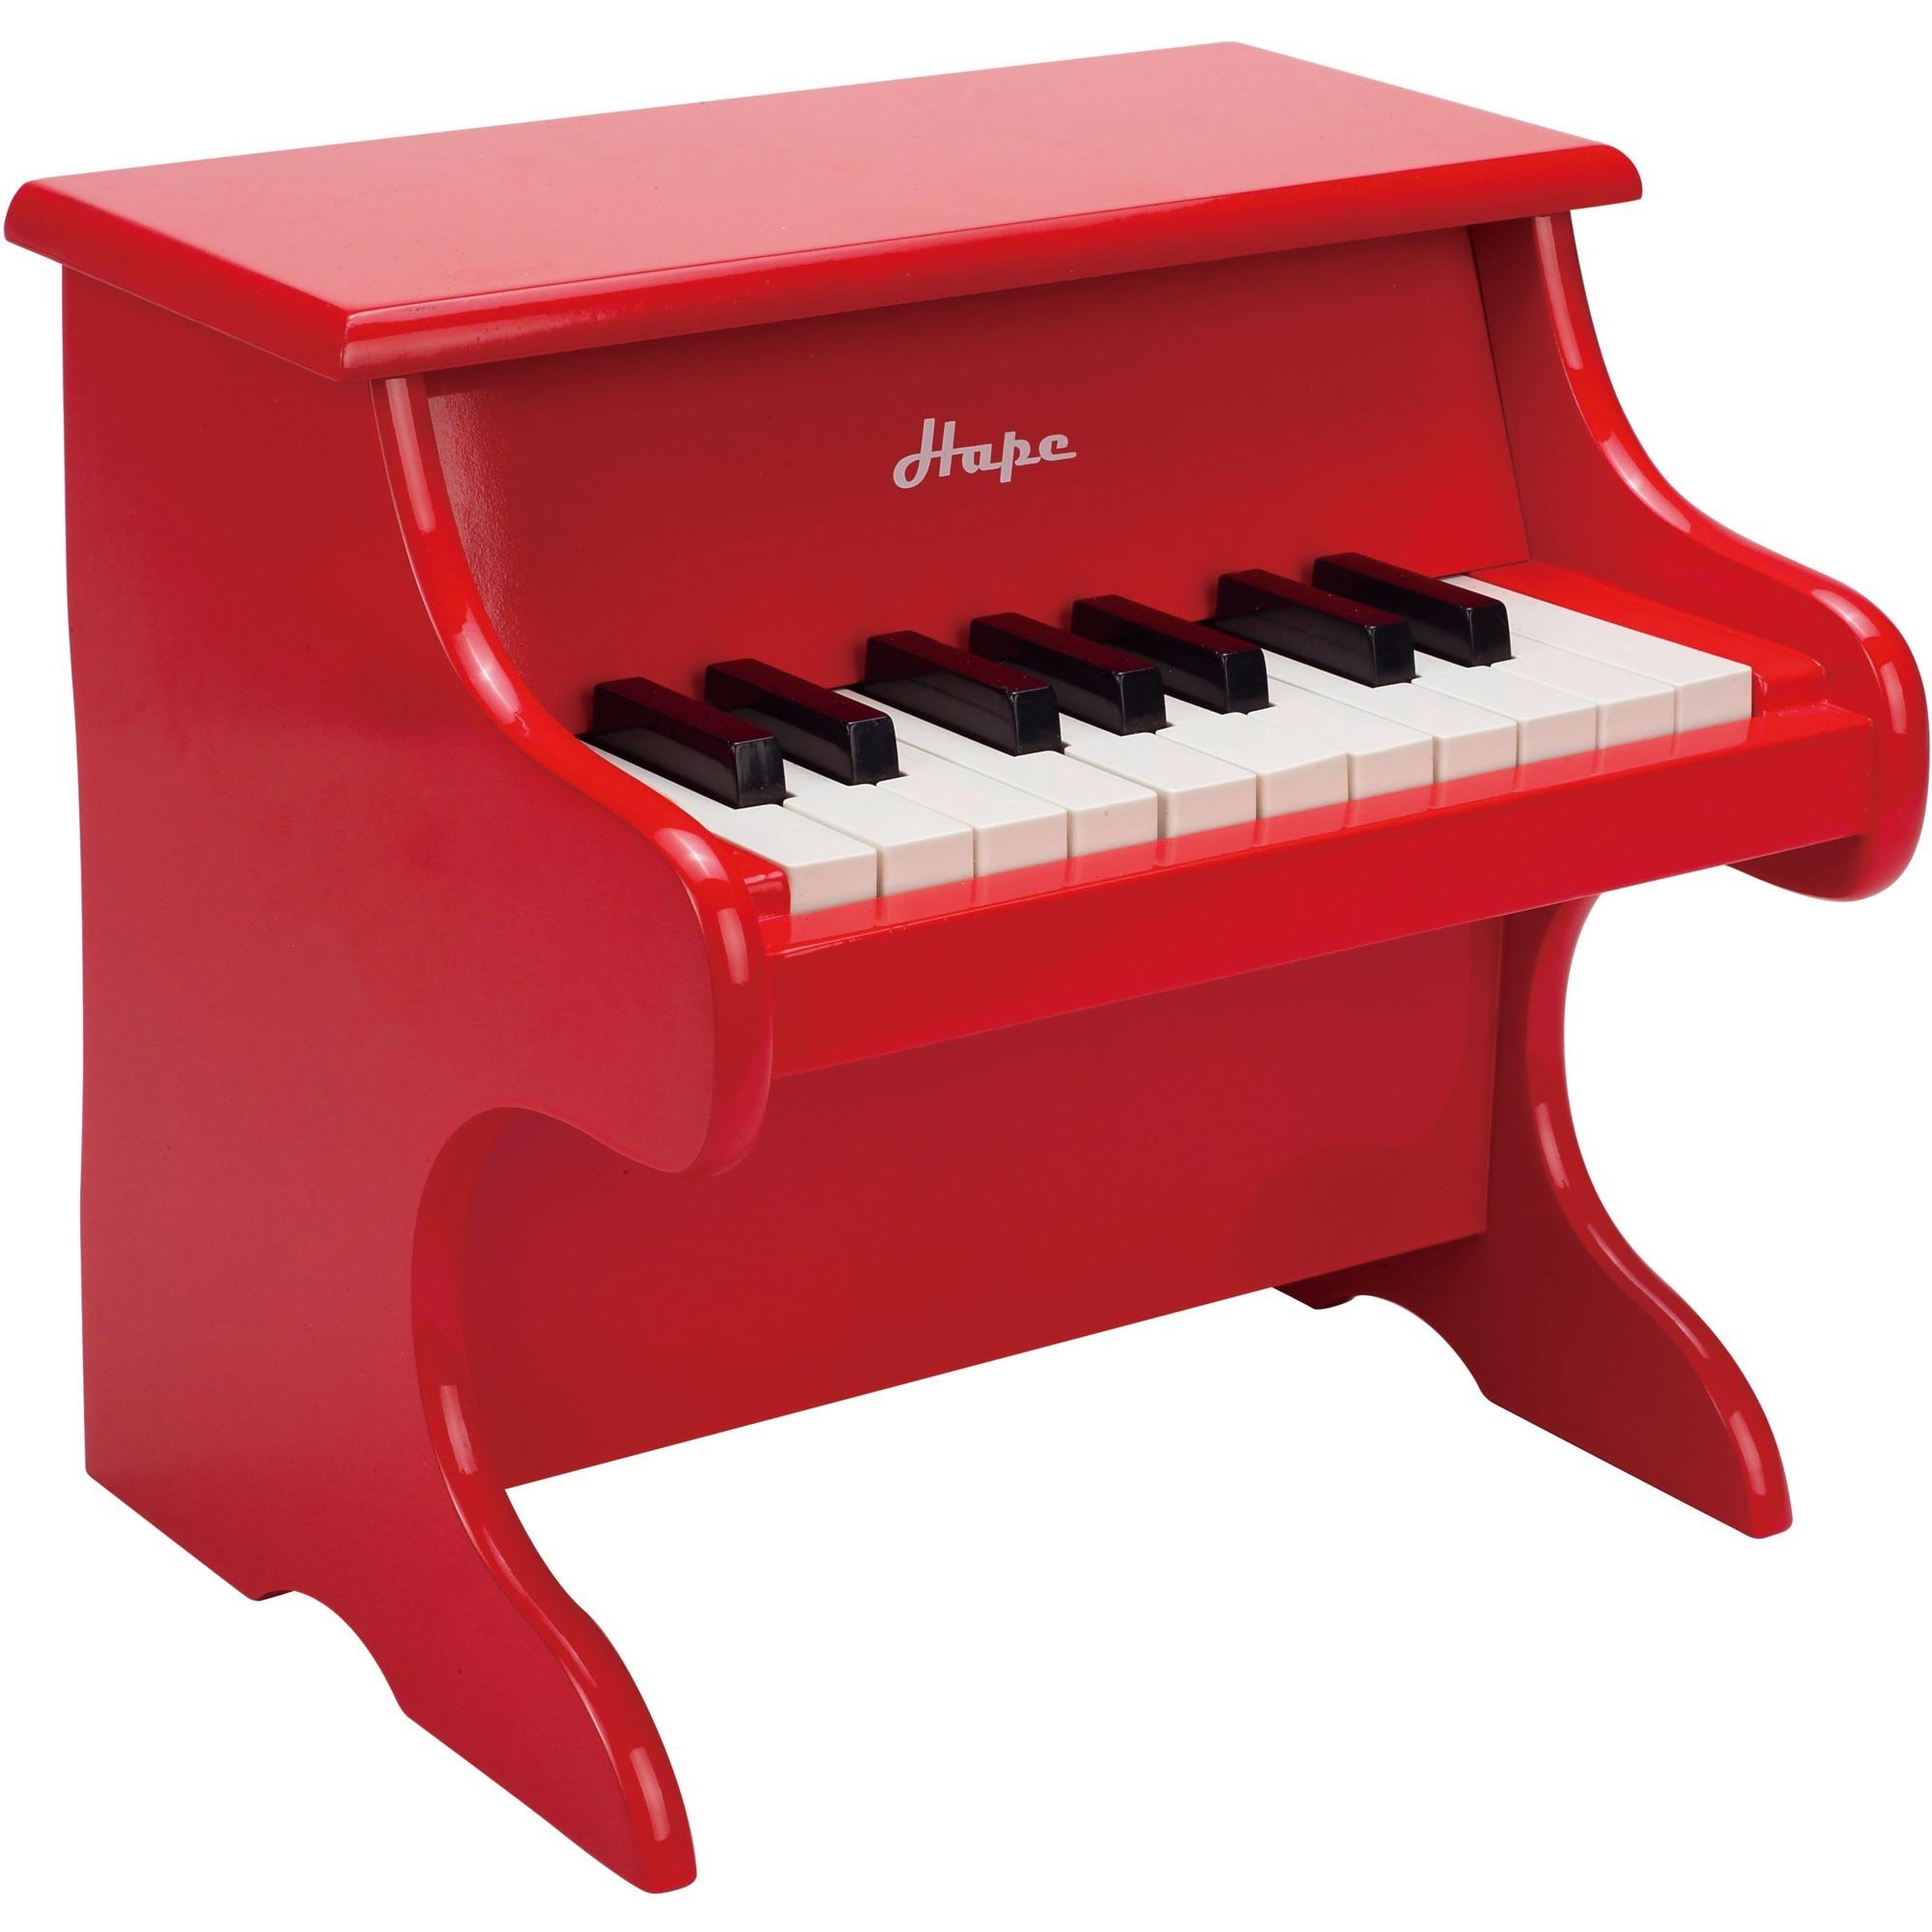 E0318 juguete musical, Juguetes musicales